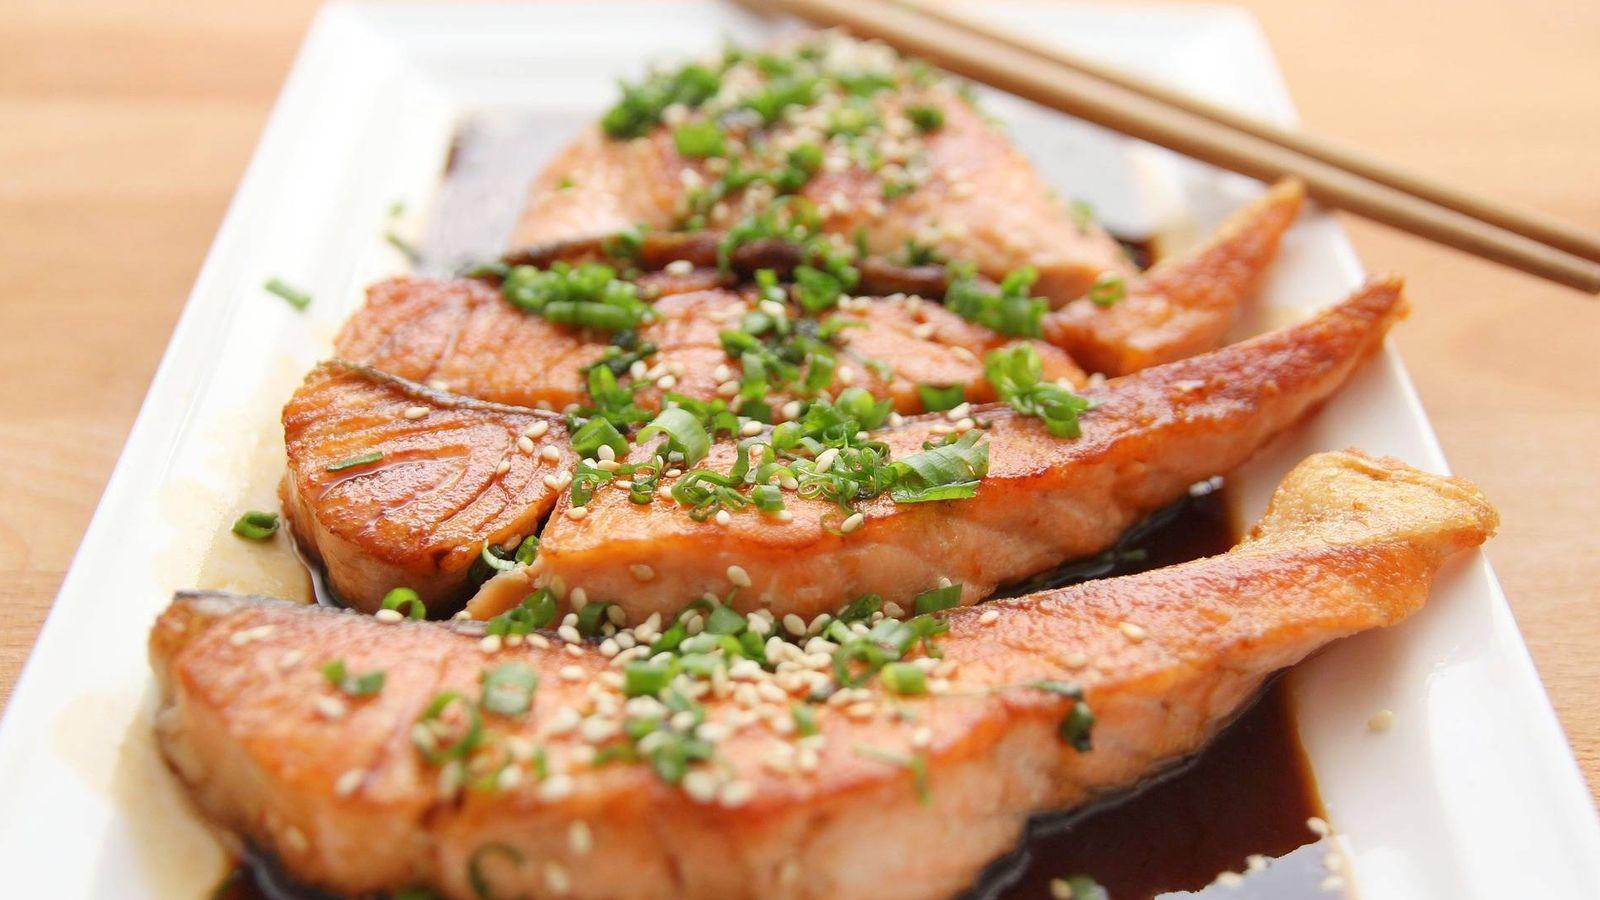 Foto: Filetes de salmón. (Pixabay)